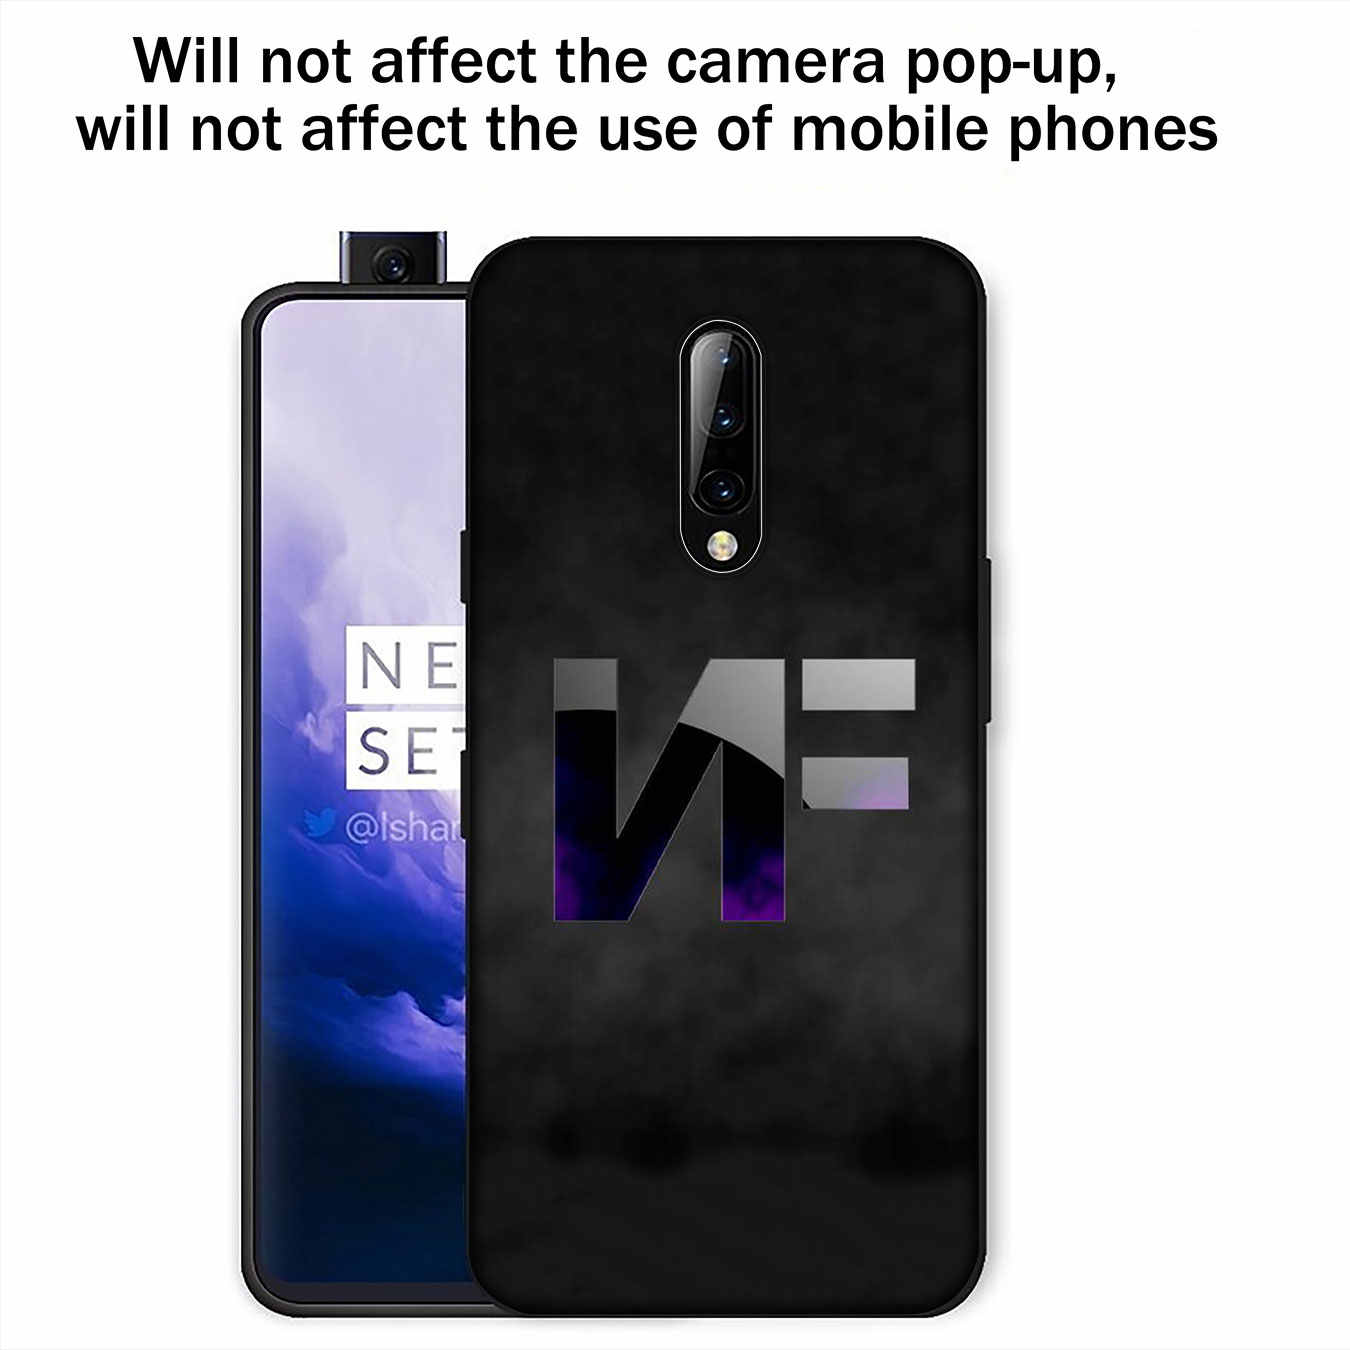 Pop NF rapero suave TPU negro silicona teléfono caso para OnePlus 7T 7 Pro 6 6T 5 5T One Plus 7Pro cubierta